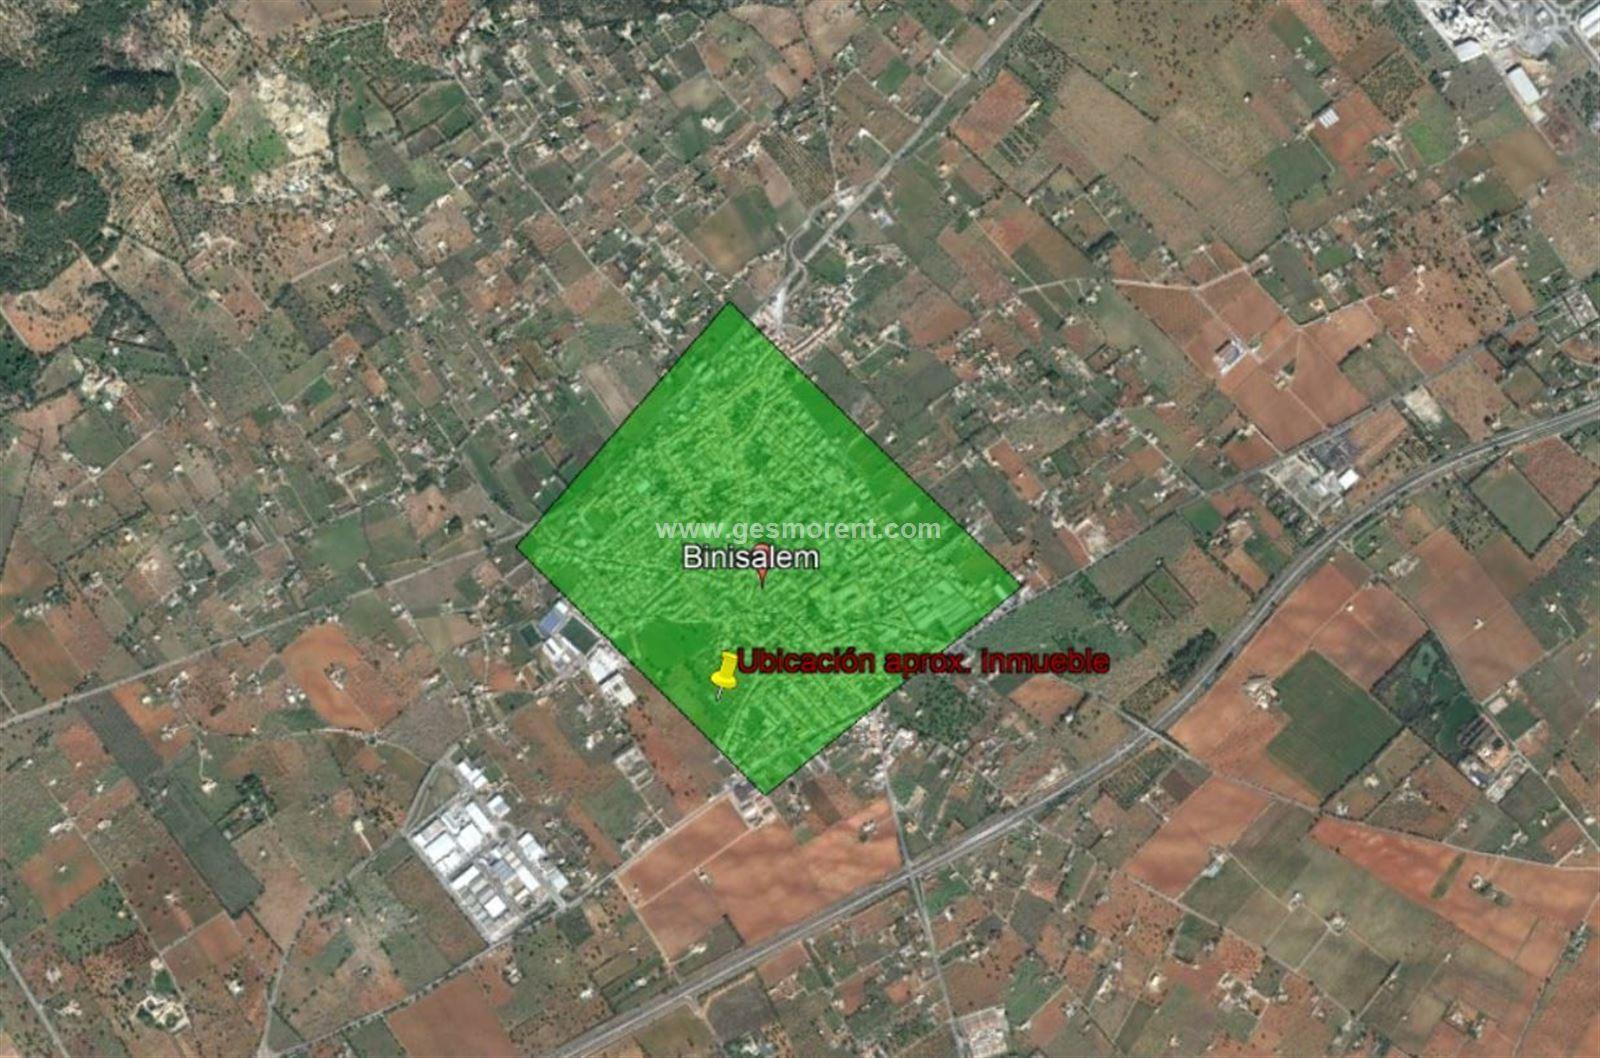 Location Bâtiment à usage industriel  Binissalem - binissalem pueblo. Nave en alquiler en binissalem